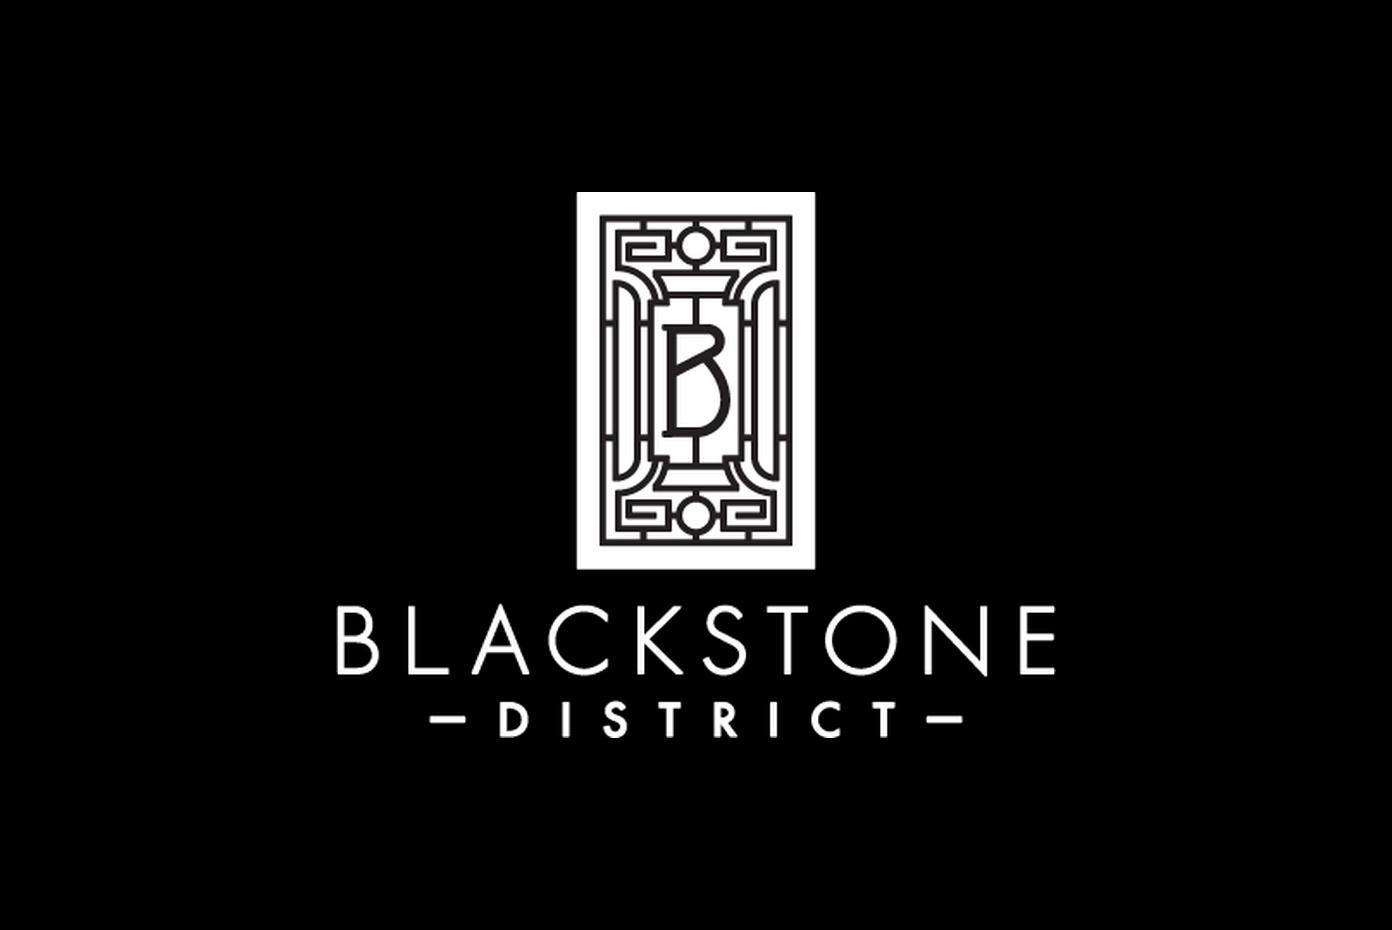 blackstone gift card